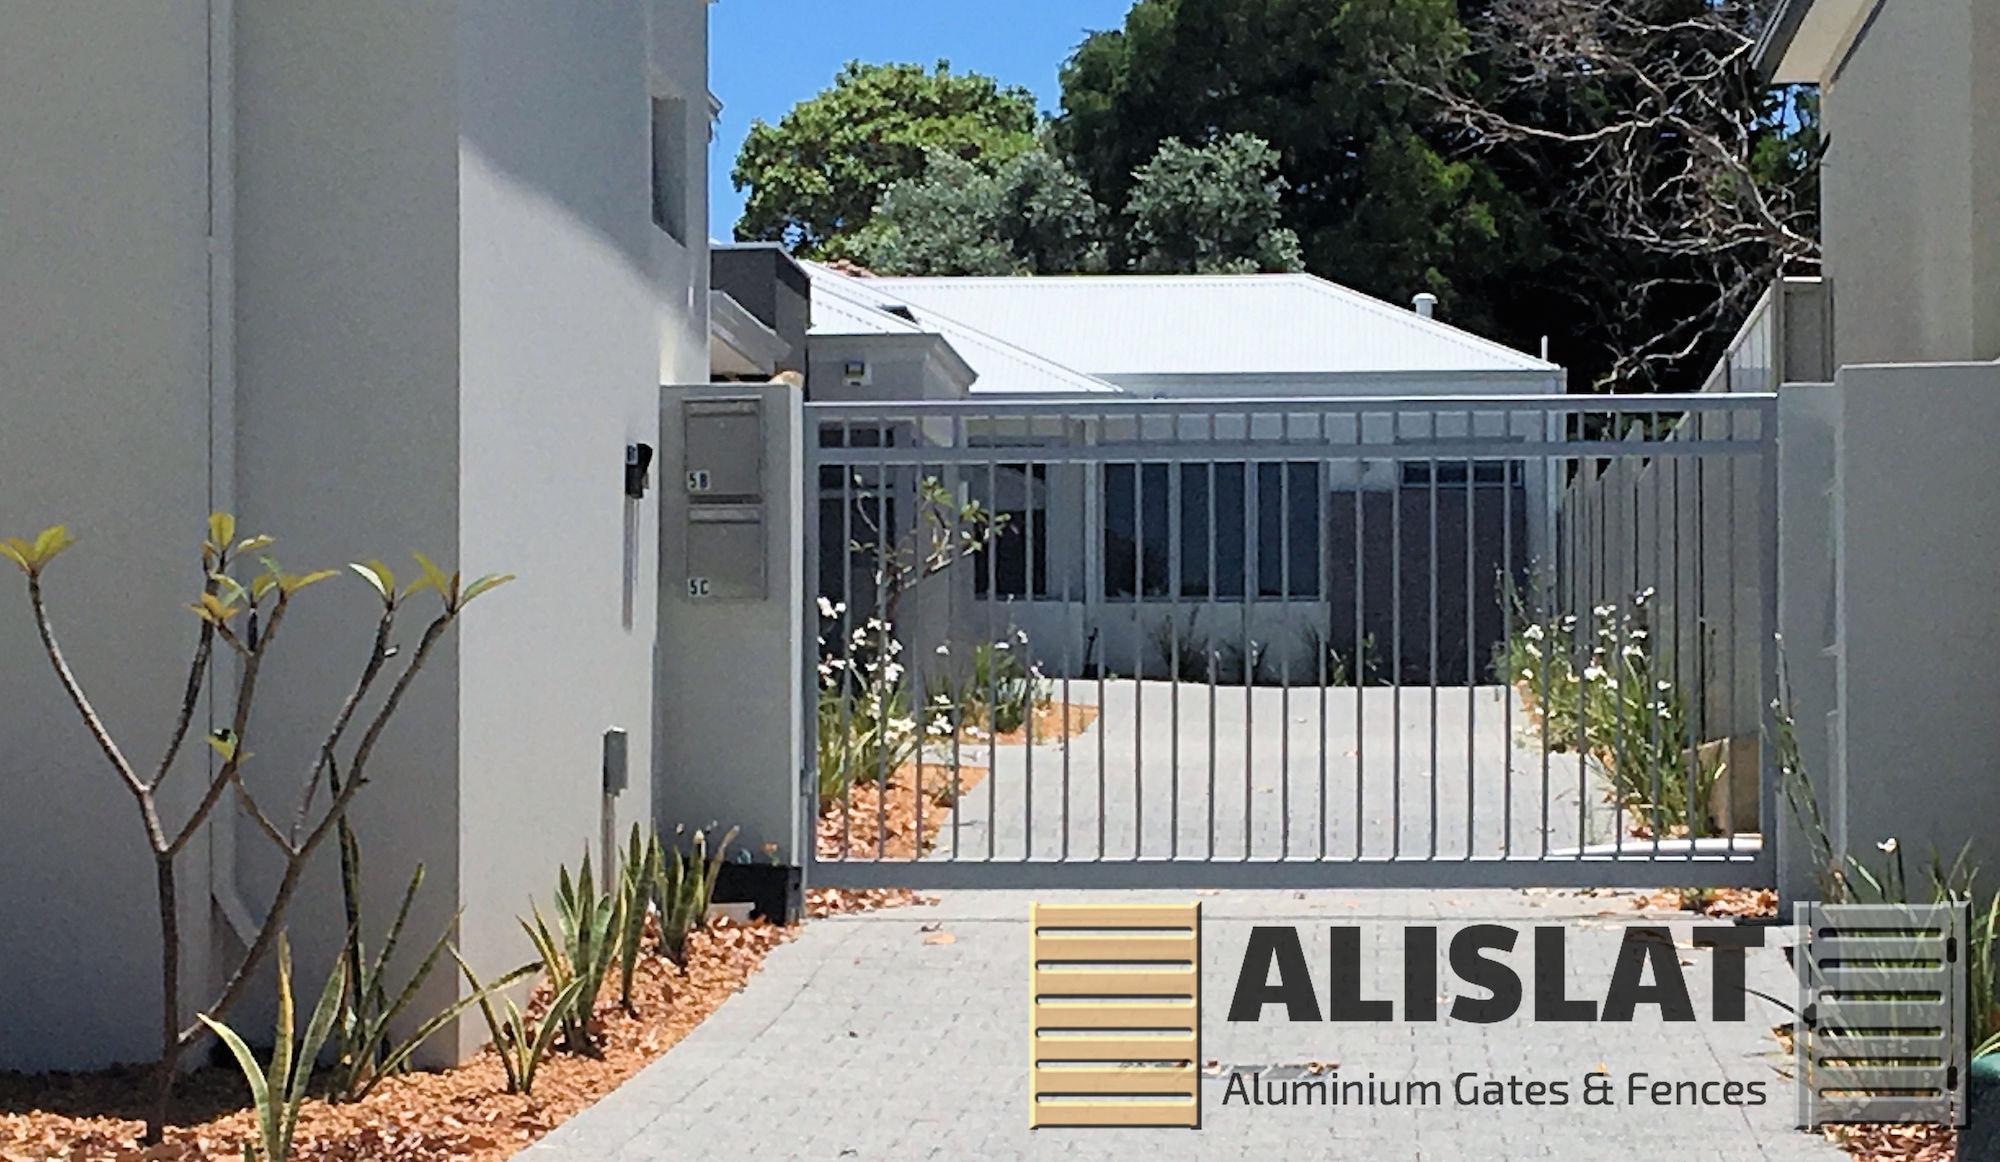 ALISLAT Gate 1